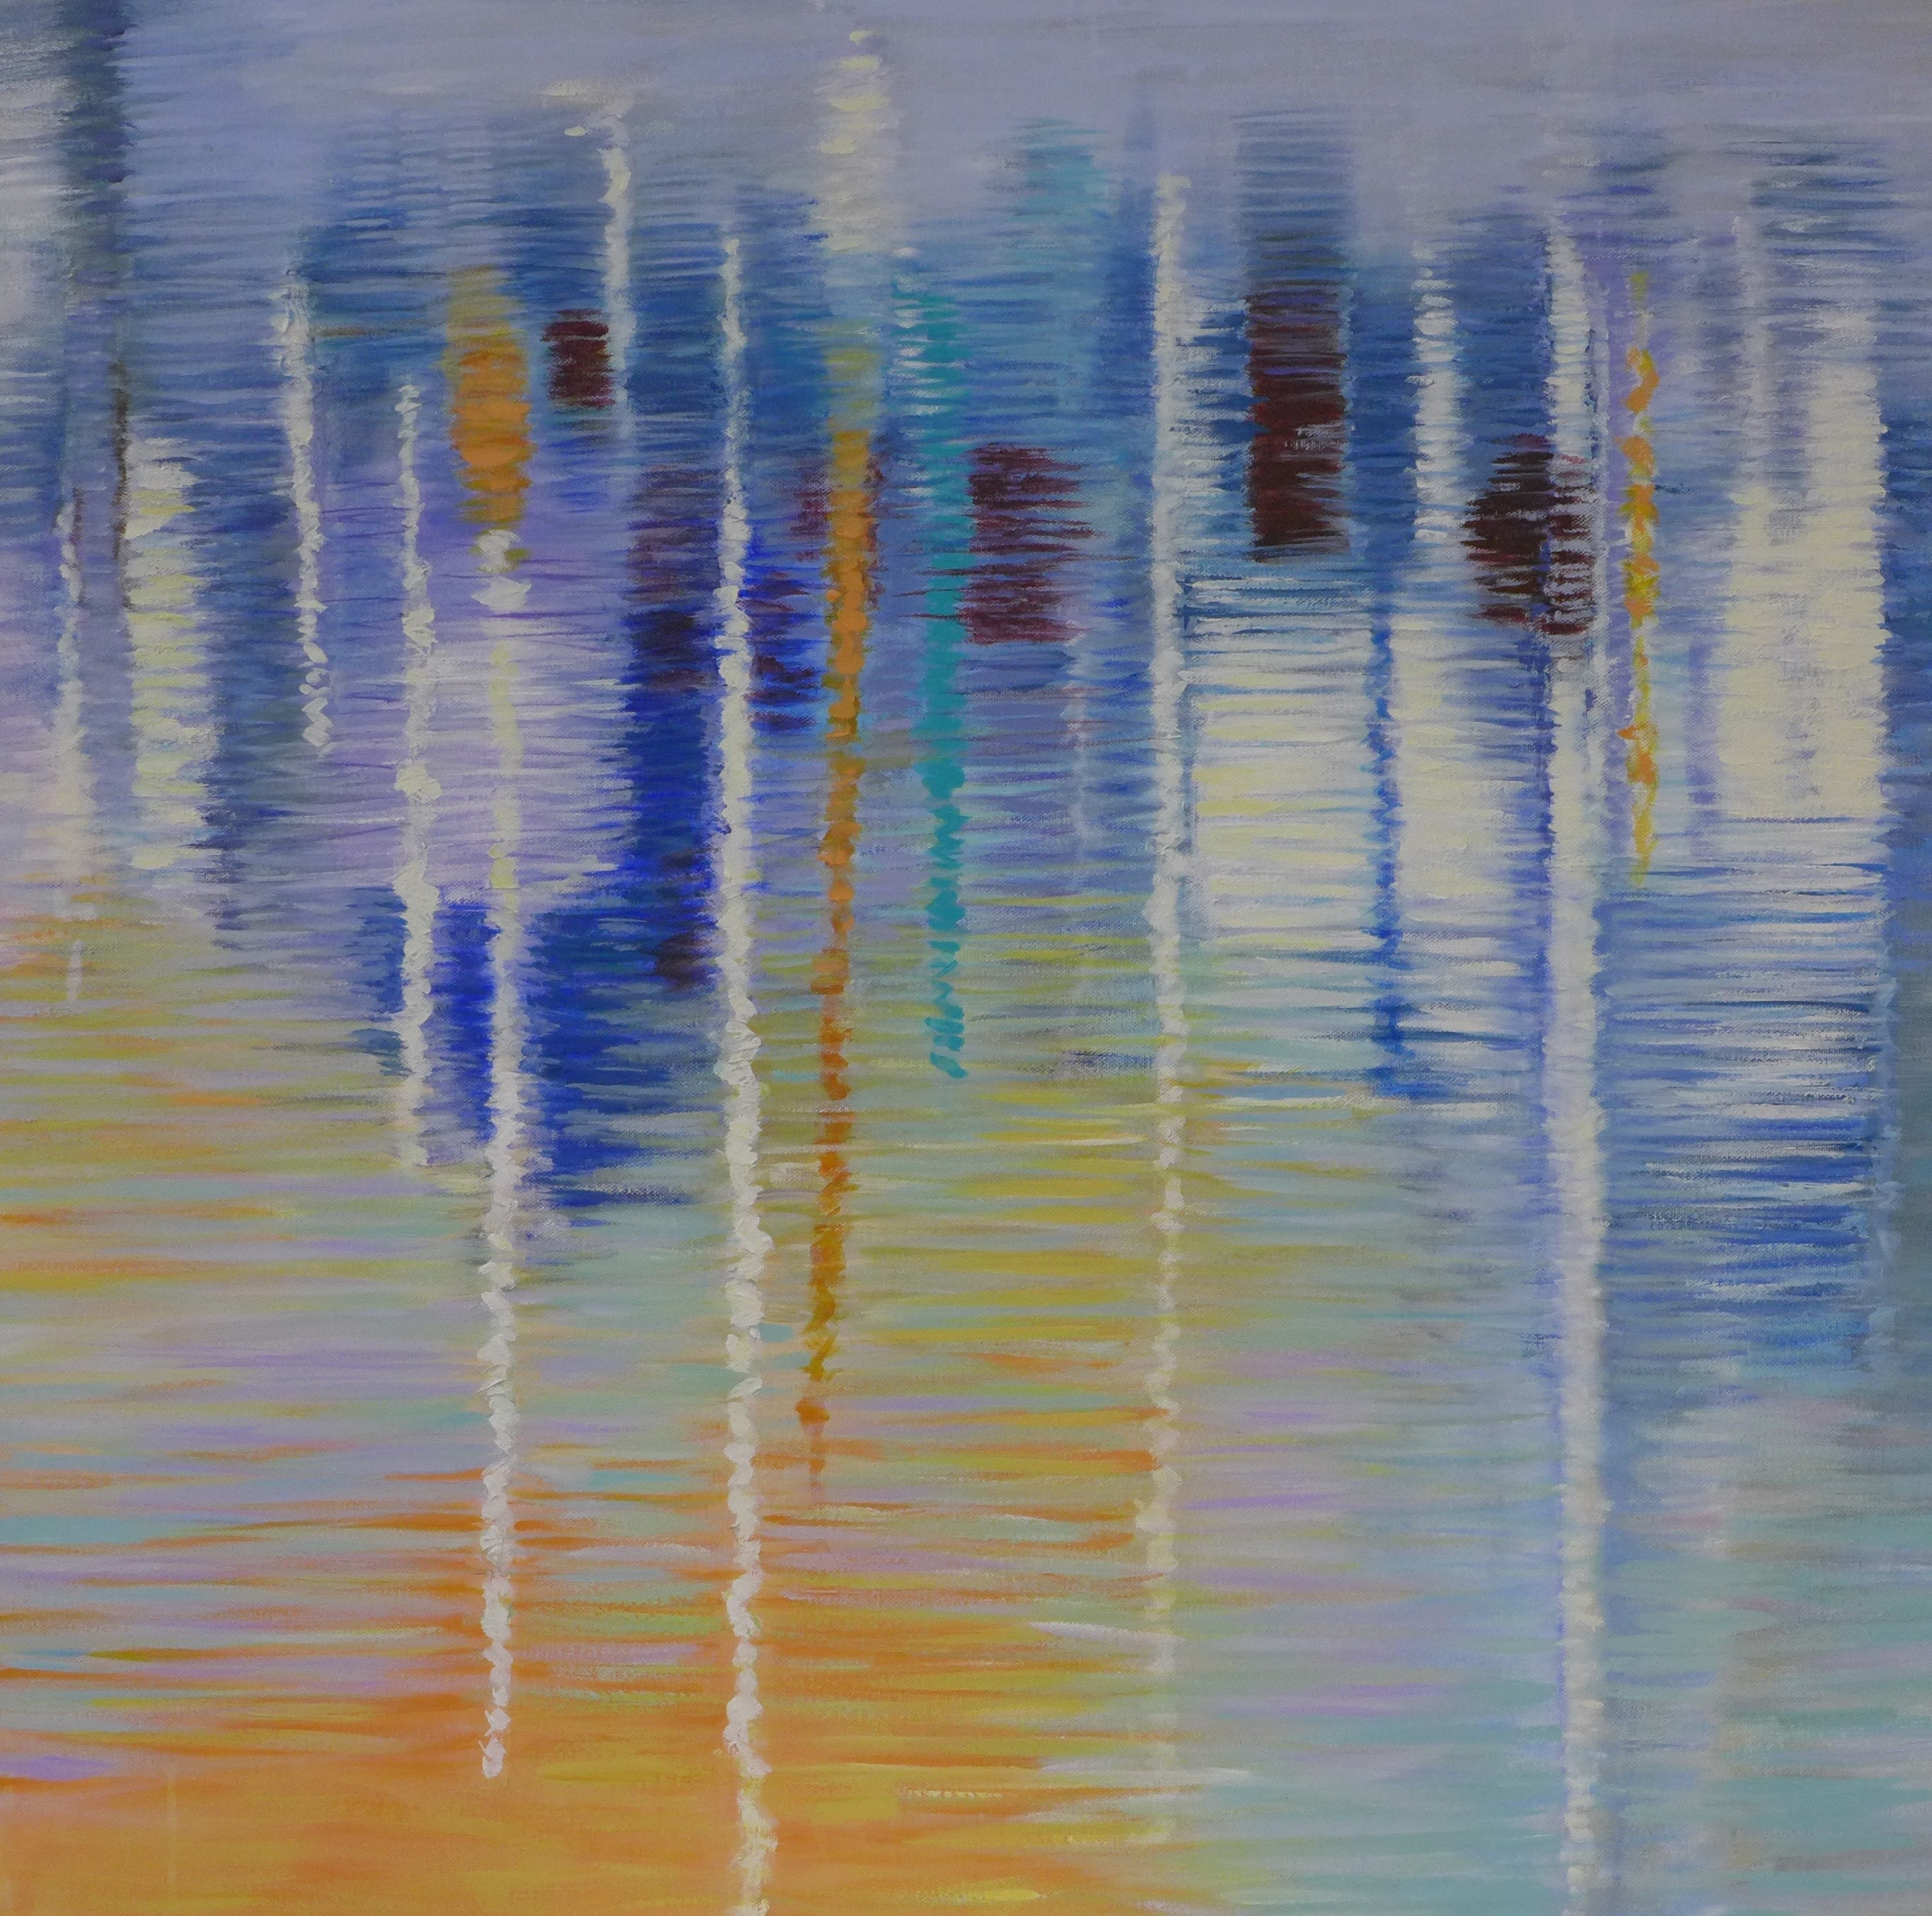 Marina Reflections #6 by Mira Kamada